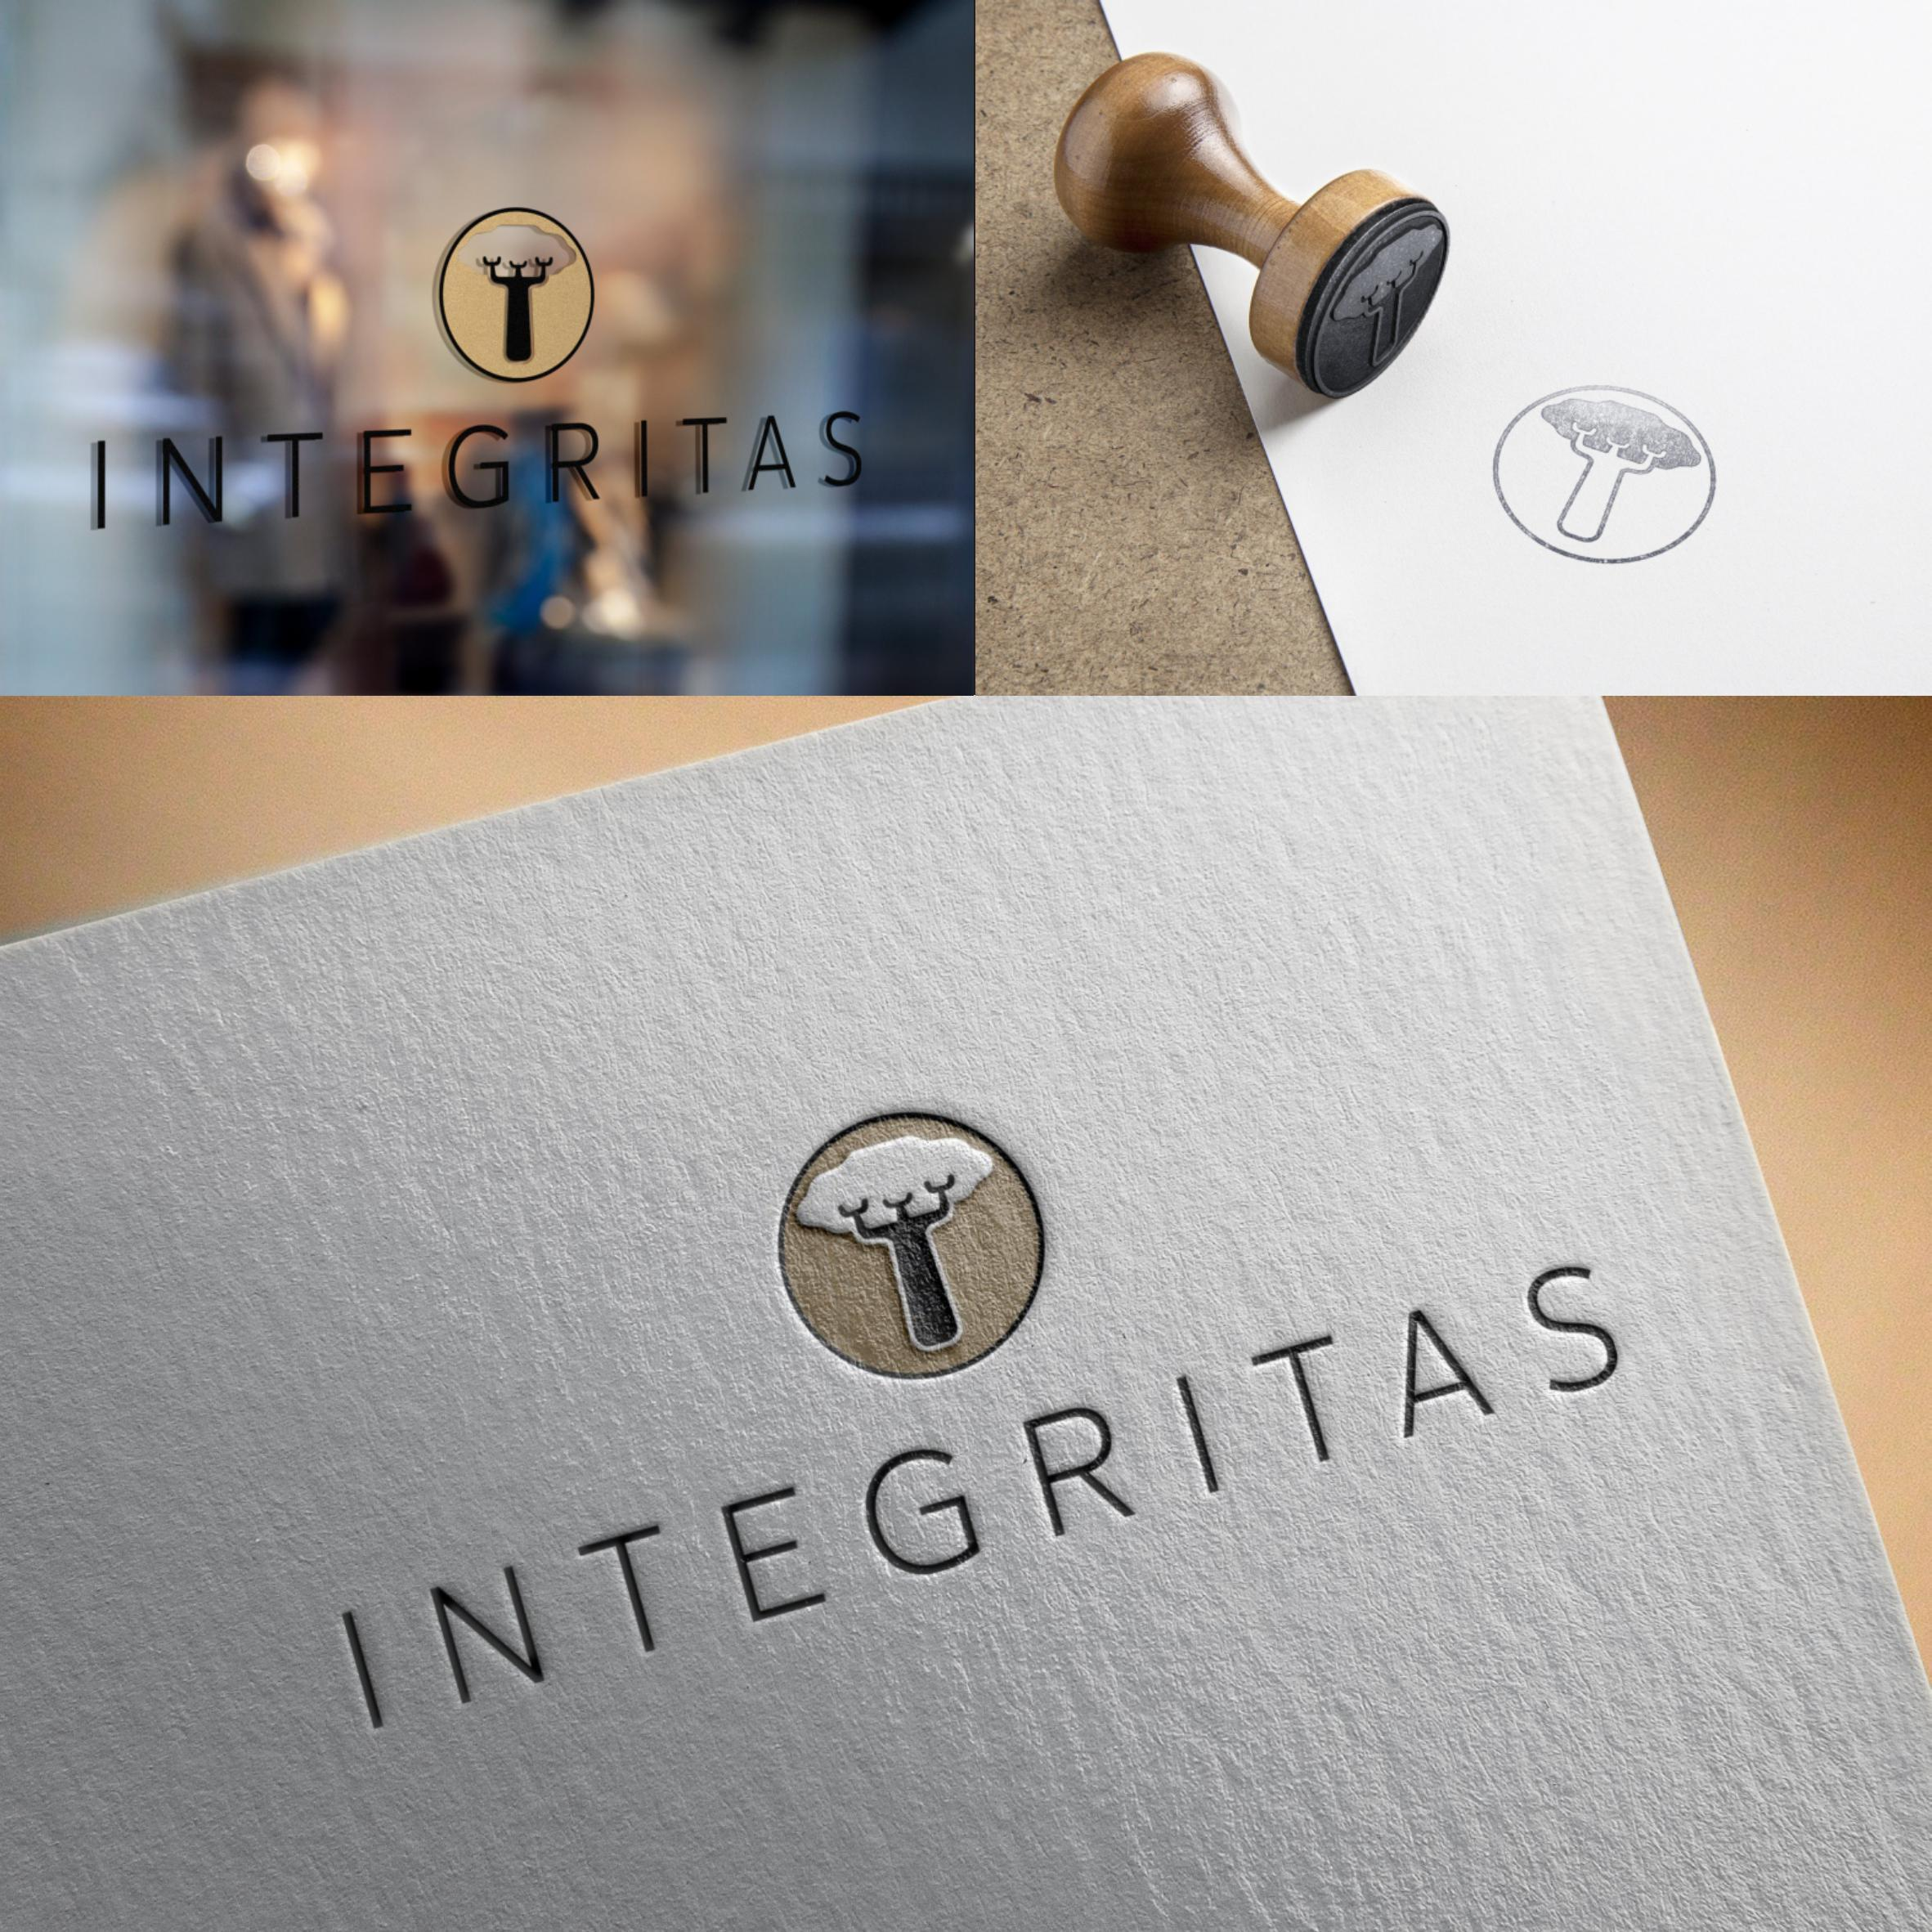 integritas-logo-mock-up-ontwerp